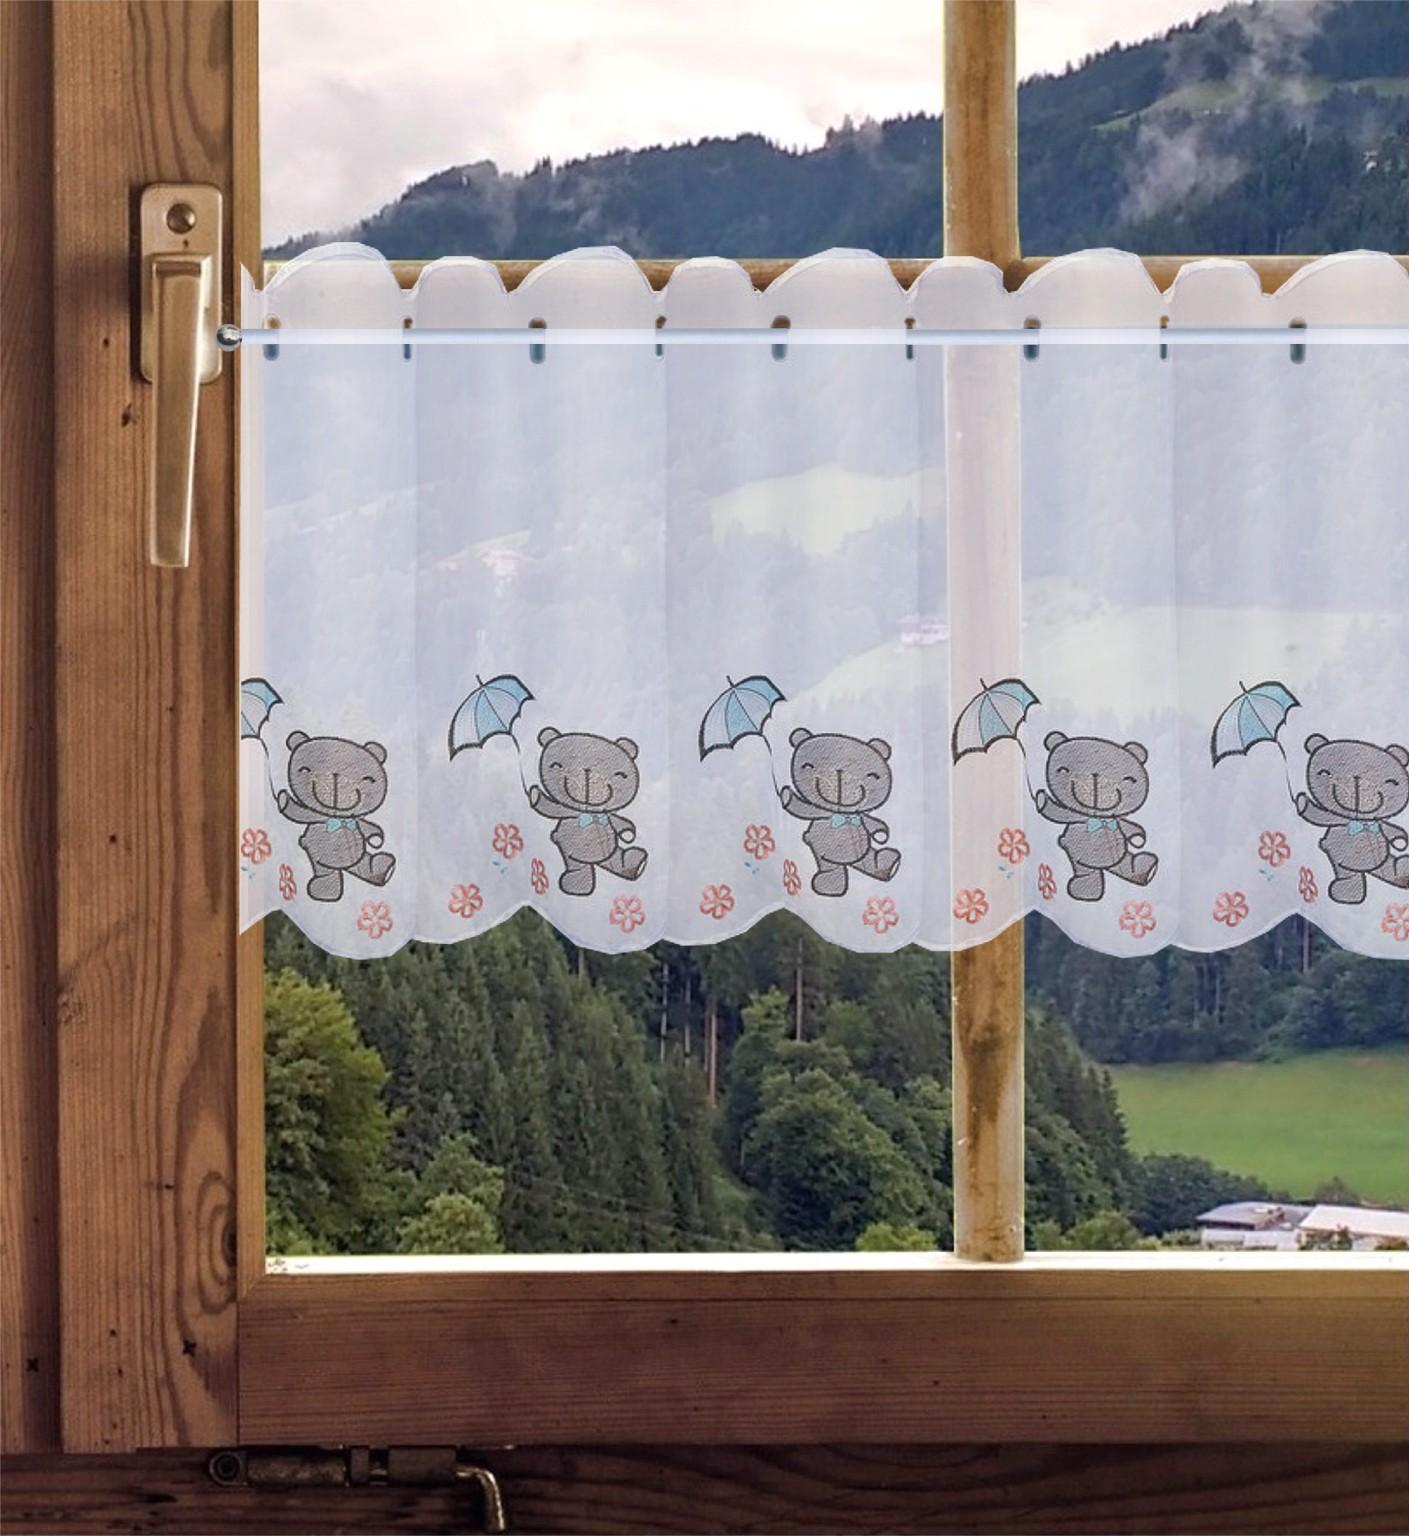 Full Size of Scheibengardine Kinderzimmer Gardinen Welt Online Shop Bestickte Teddy Regal Weiß Scheibengardinen Küche Regale Sofa Kinderzimmer Scheibengardine Kinderzimmer